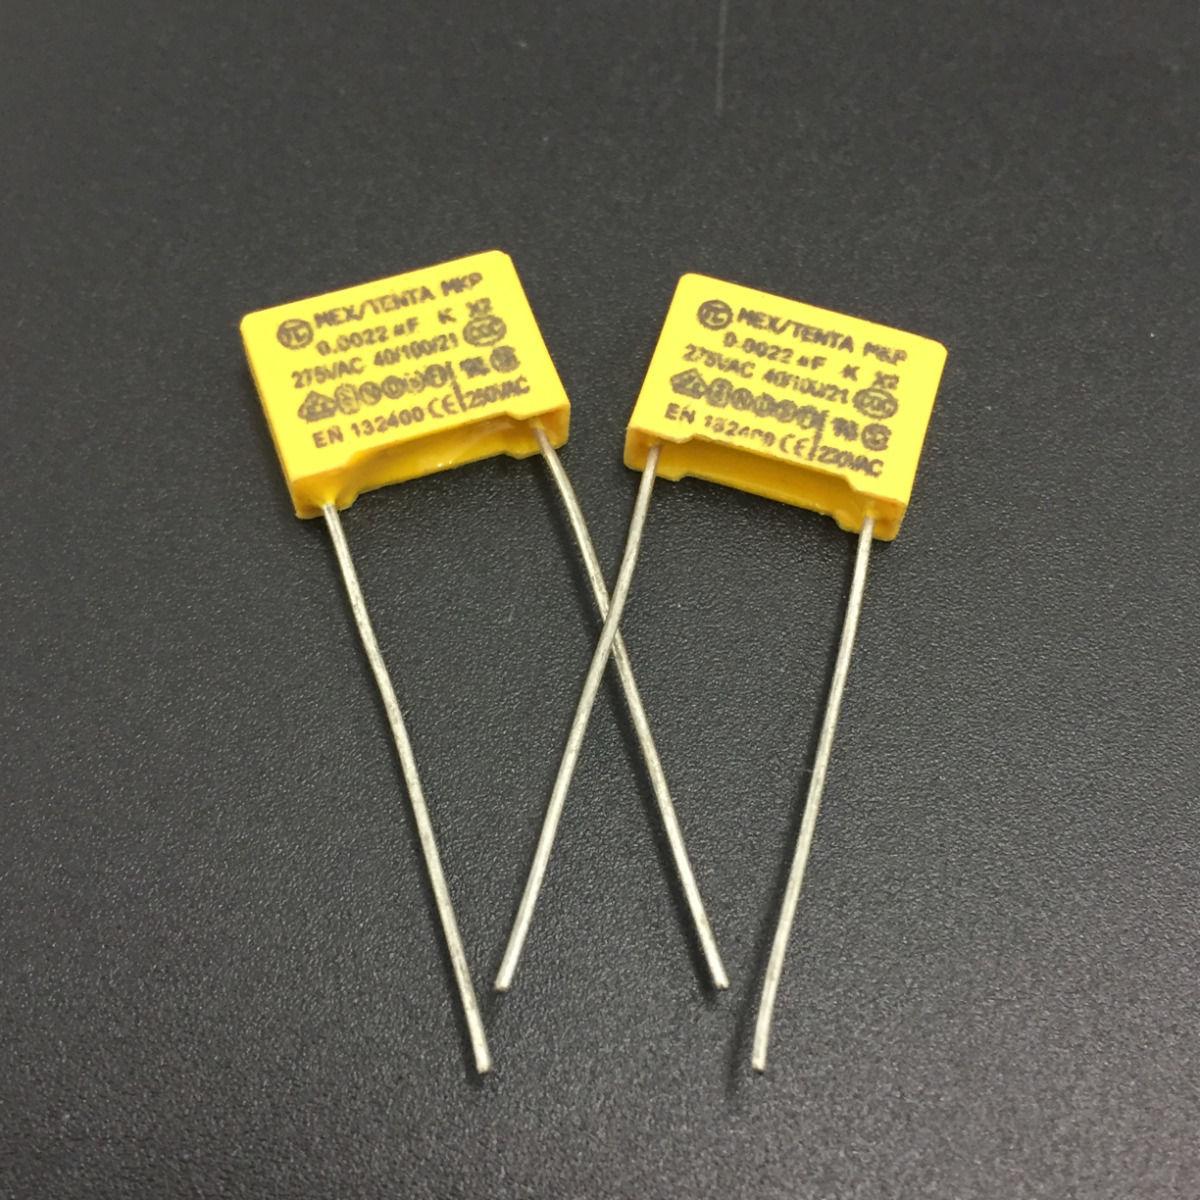 capacitor con película 10 X 2,2 Nf 0.0022 Uf 100v 5/% poliéster